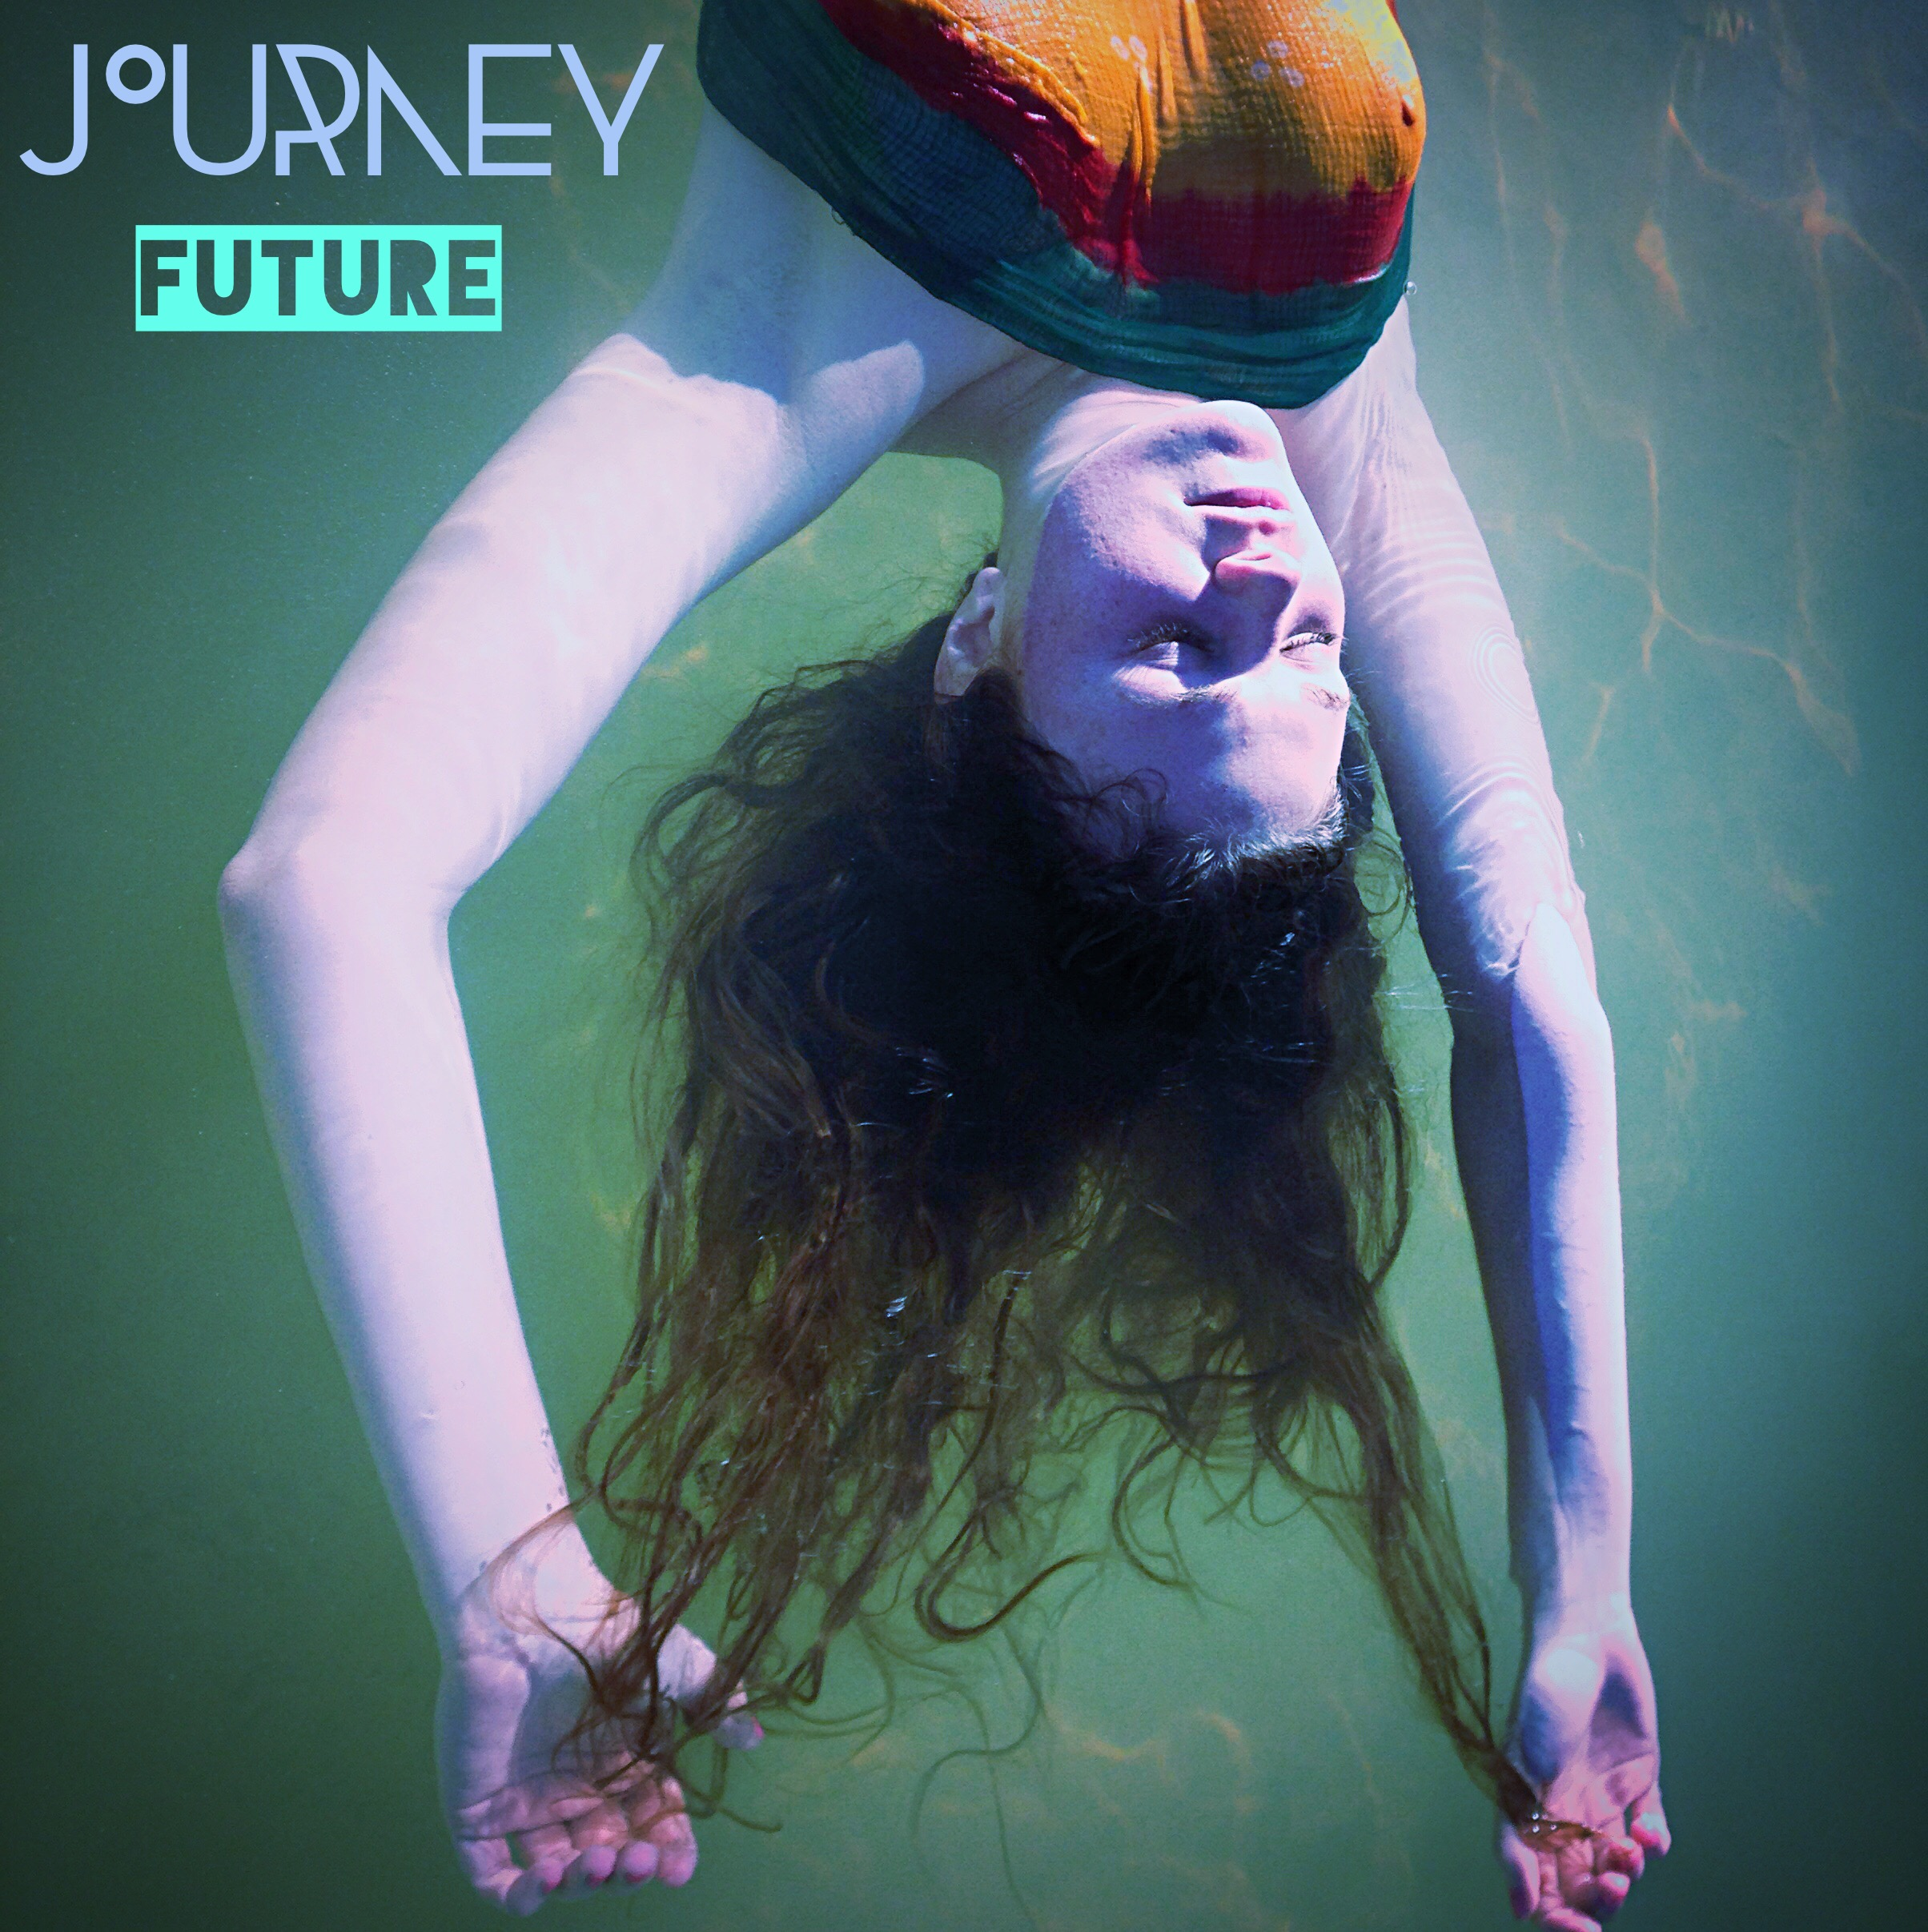 JOURNEY FUTURE